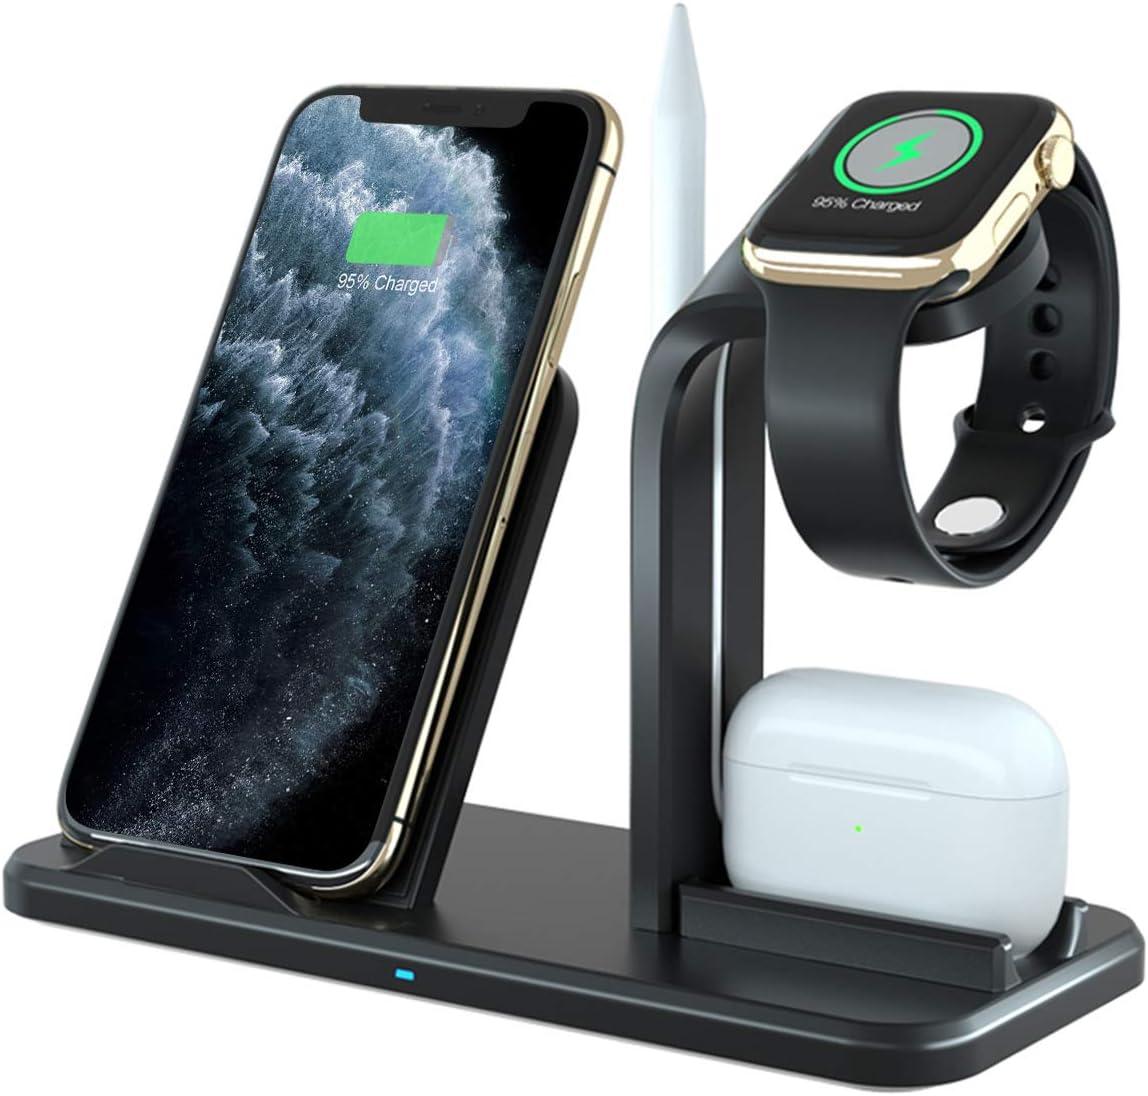 CARPURIDE Cargador Inalámbrico Rápido, [4 in 1] Qi Base de Carga para Apple Watch Series 1/2/3/4/5, AirPods, iPhone 11/11 Pro/11 Pro MAX/XS MAX/XR/X/8 Plus, Inalámbrica Carga para Galaxy S10 S9 S8